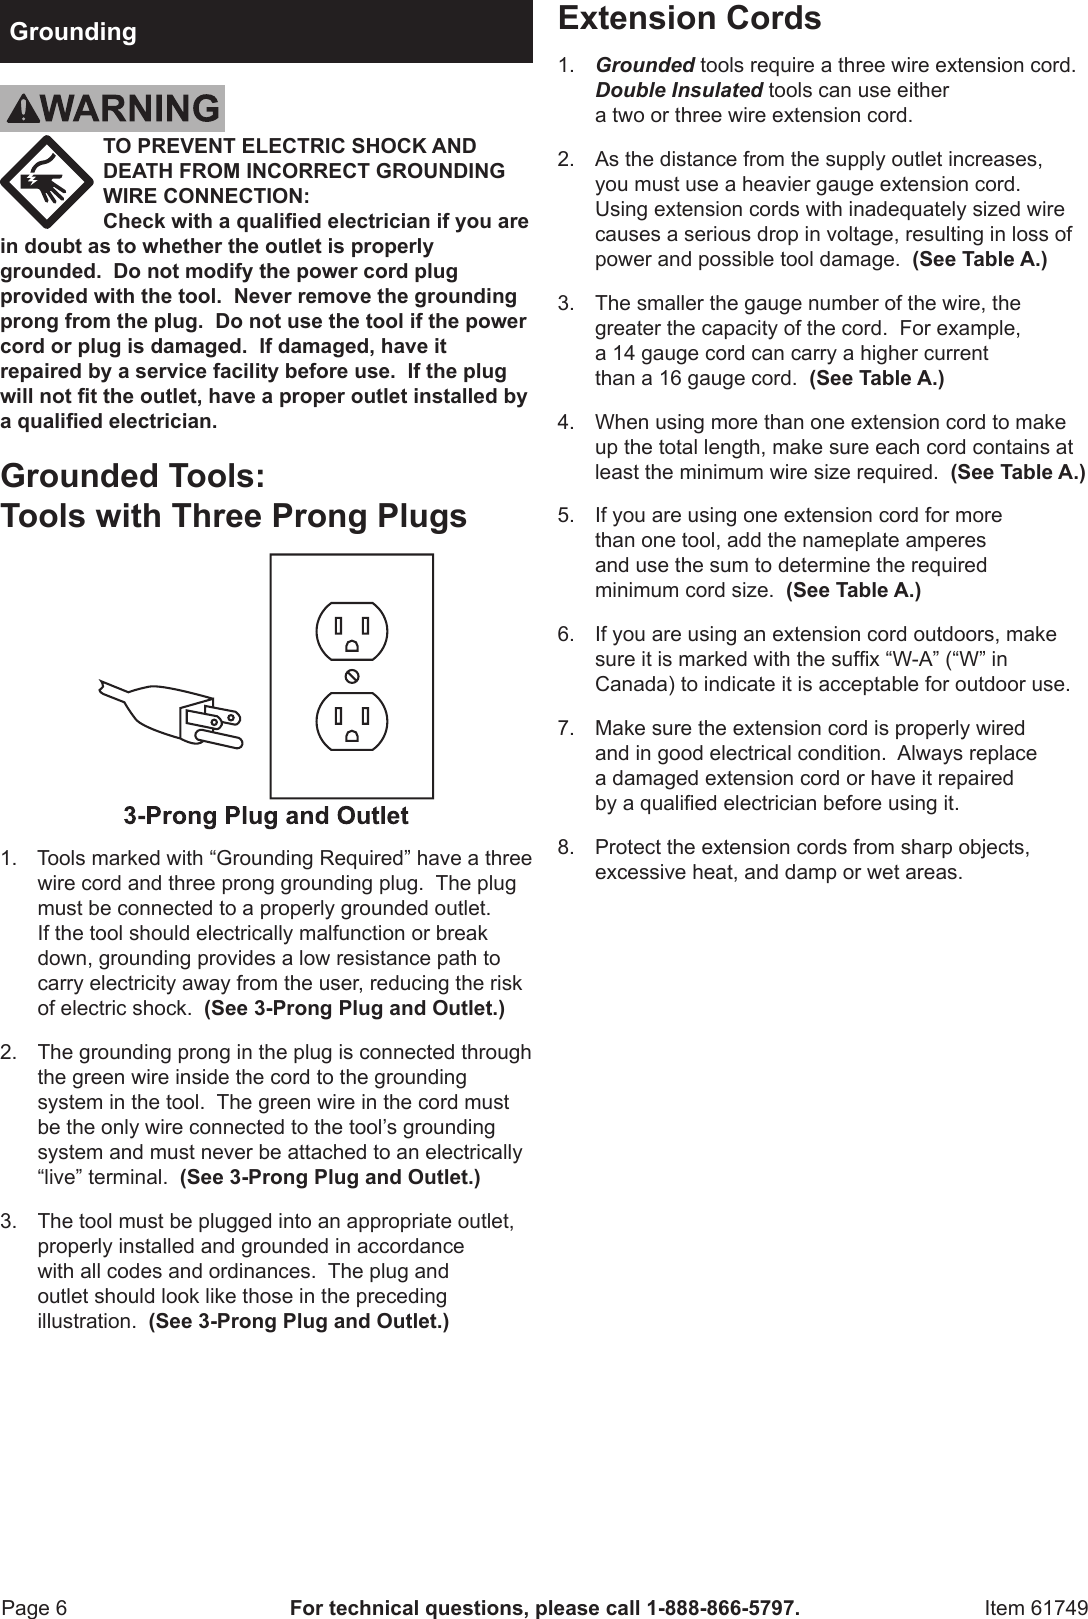 Famous Wire Gauge Tool Pattern - Wiring Diagram Ideas - blogitia.com